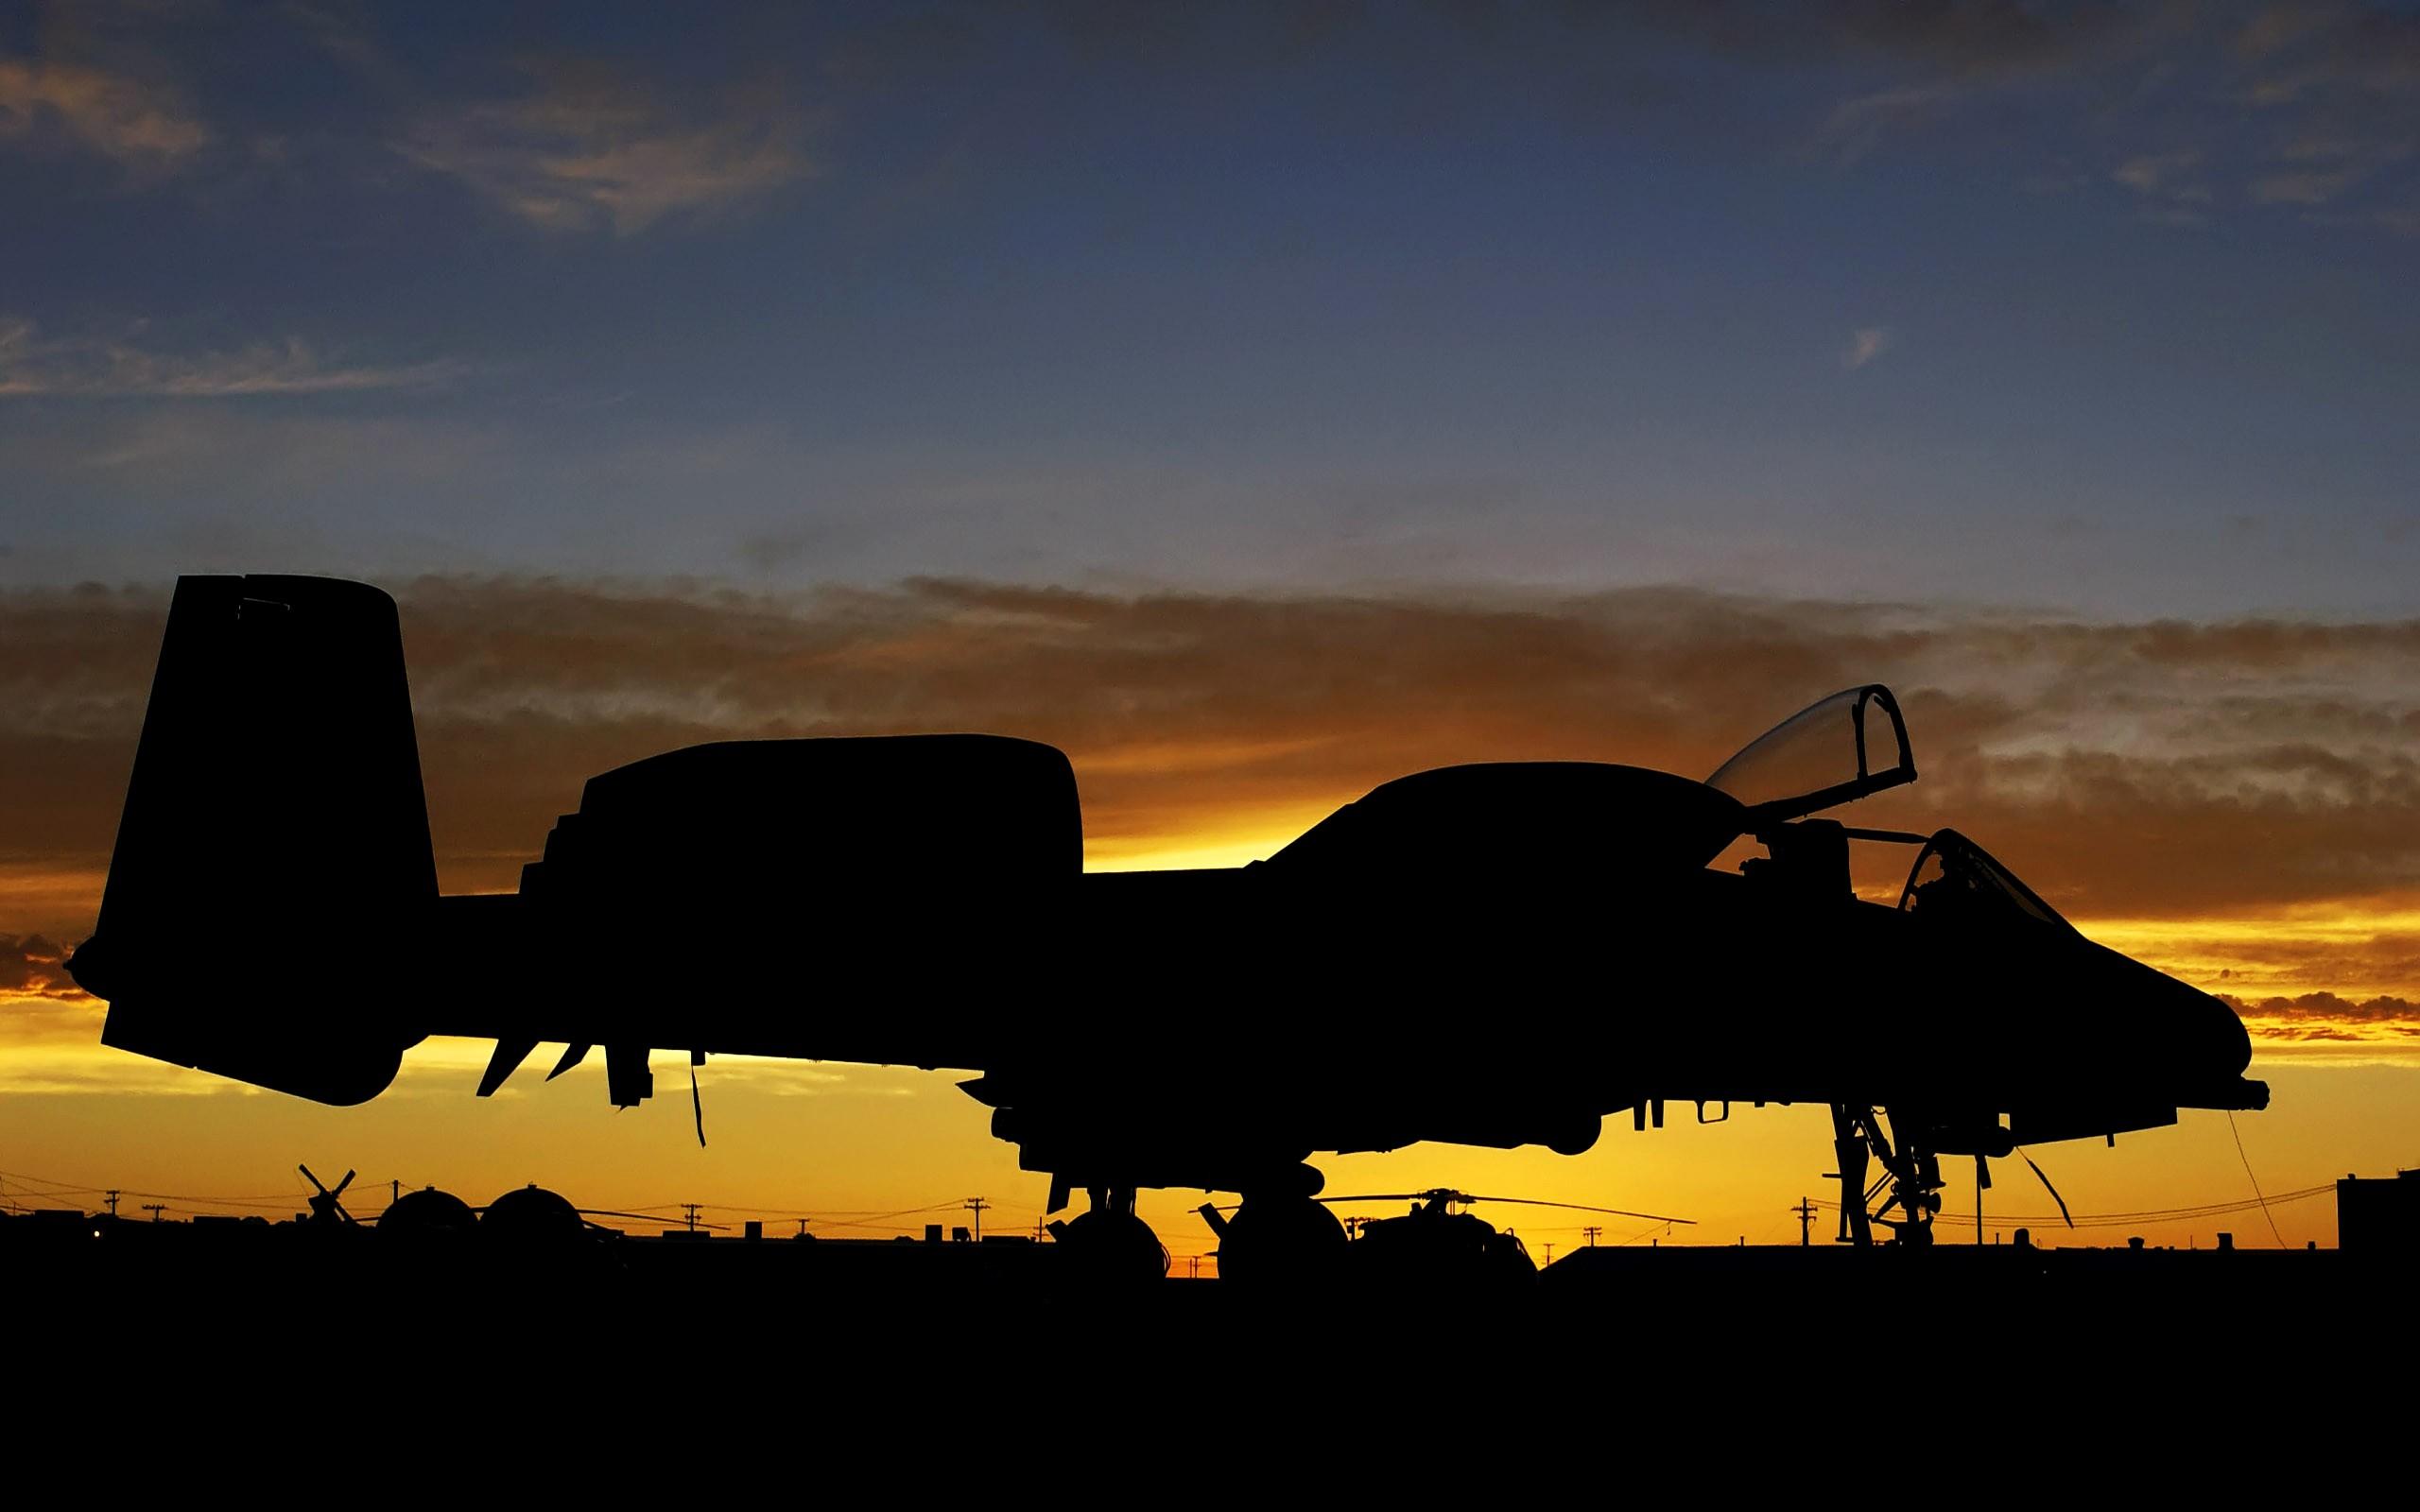 Wallpaper 10 Thunderbolt Ii 2560x1600 Px Fairchild A Military